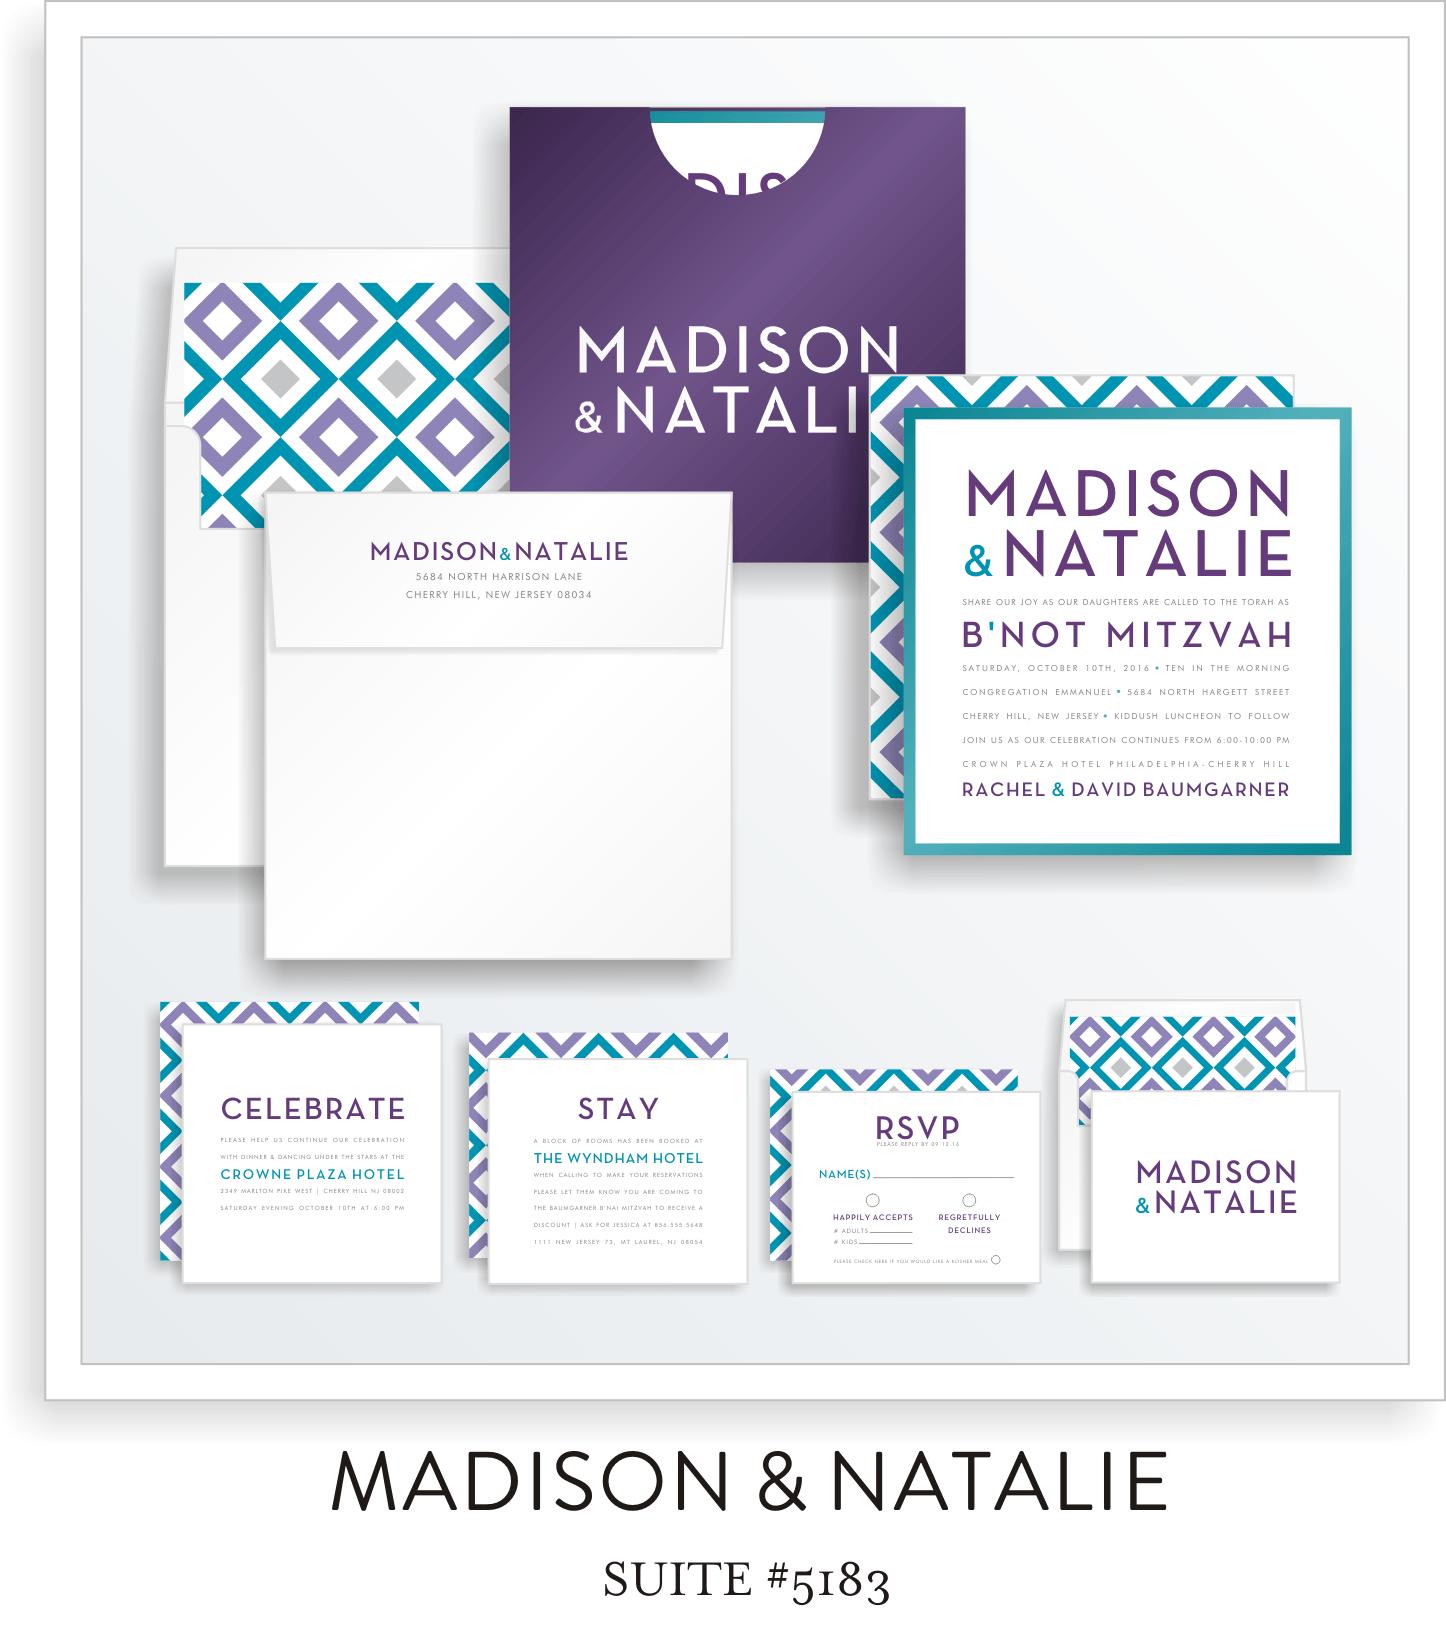 B'not Mitzvah Invitation Suite 5183 - Madison & Natalie